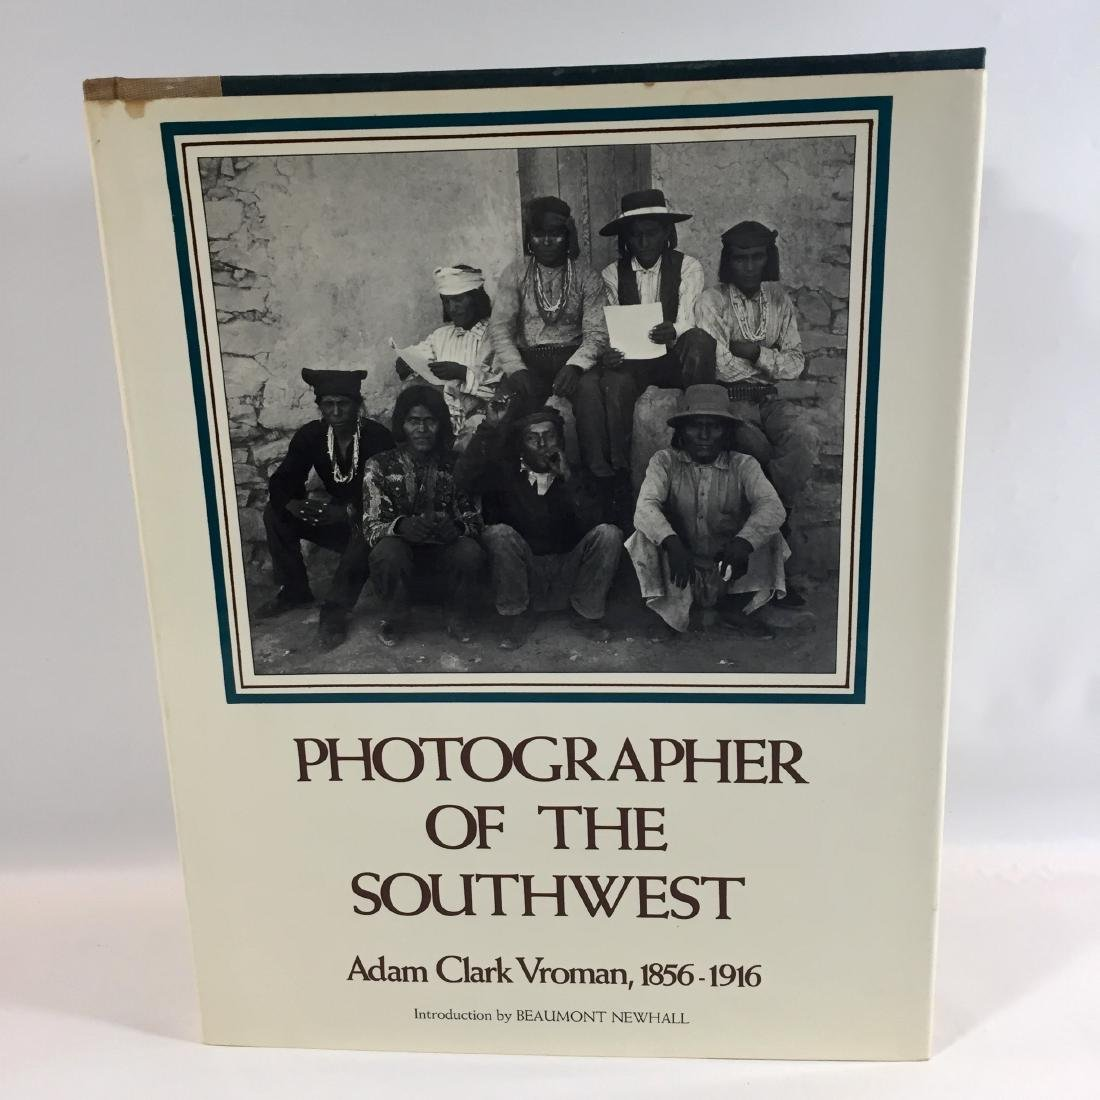 Photographer of the Southwest Ruth I. Mahood